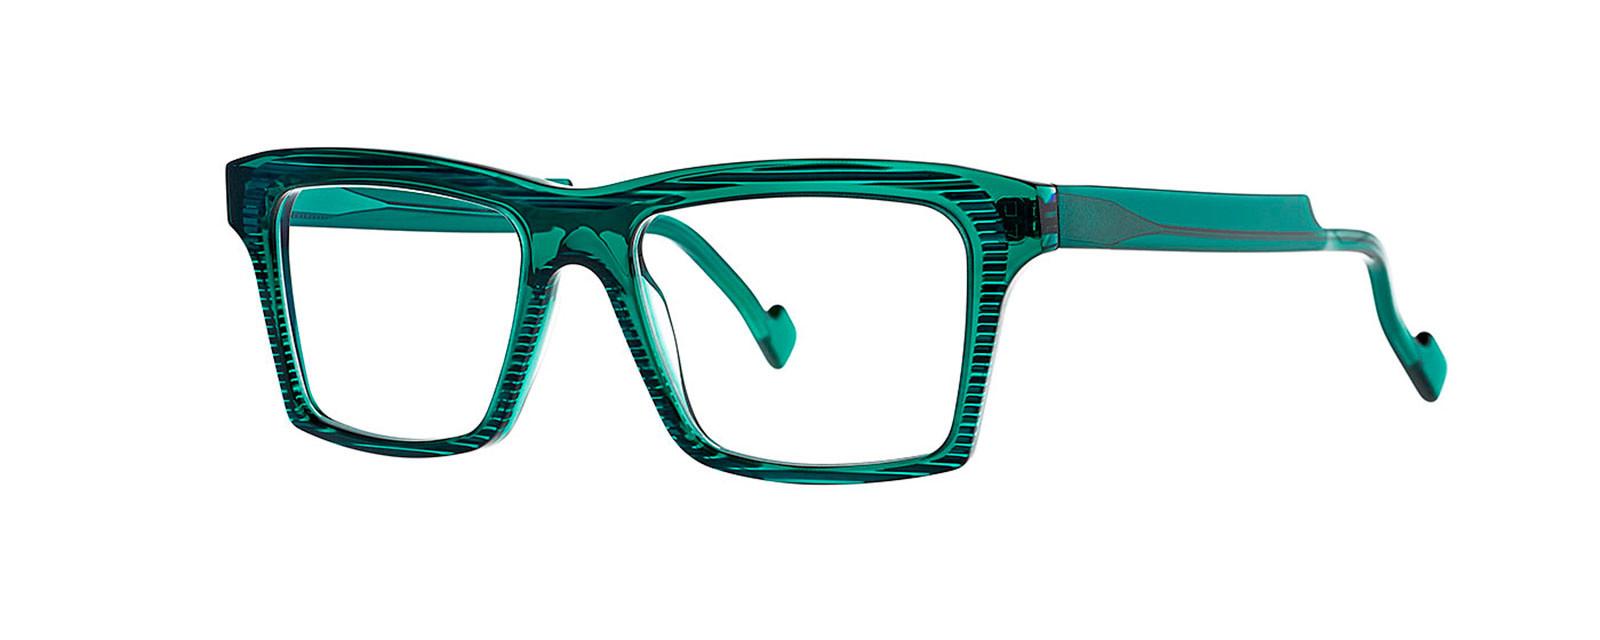 Rebus - Fashion Green/Green Lined